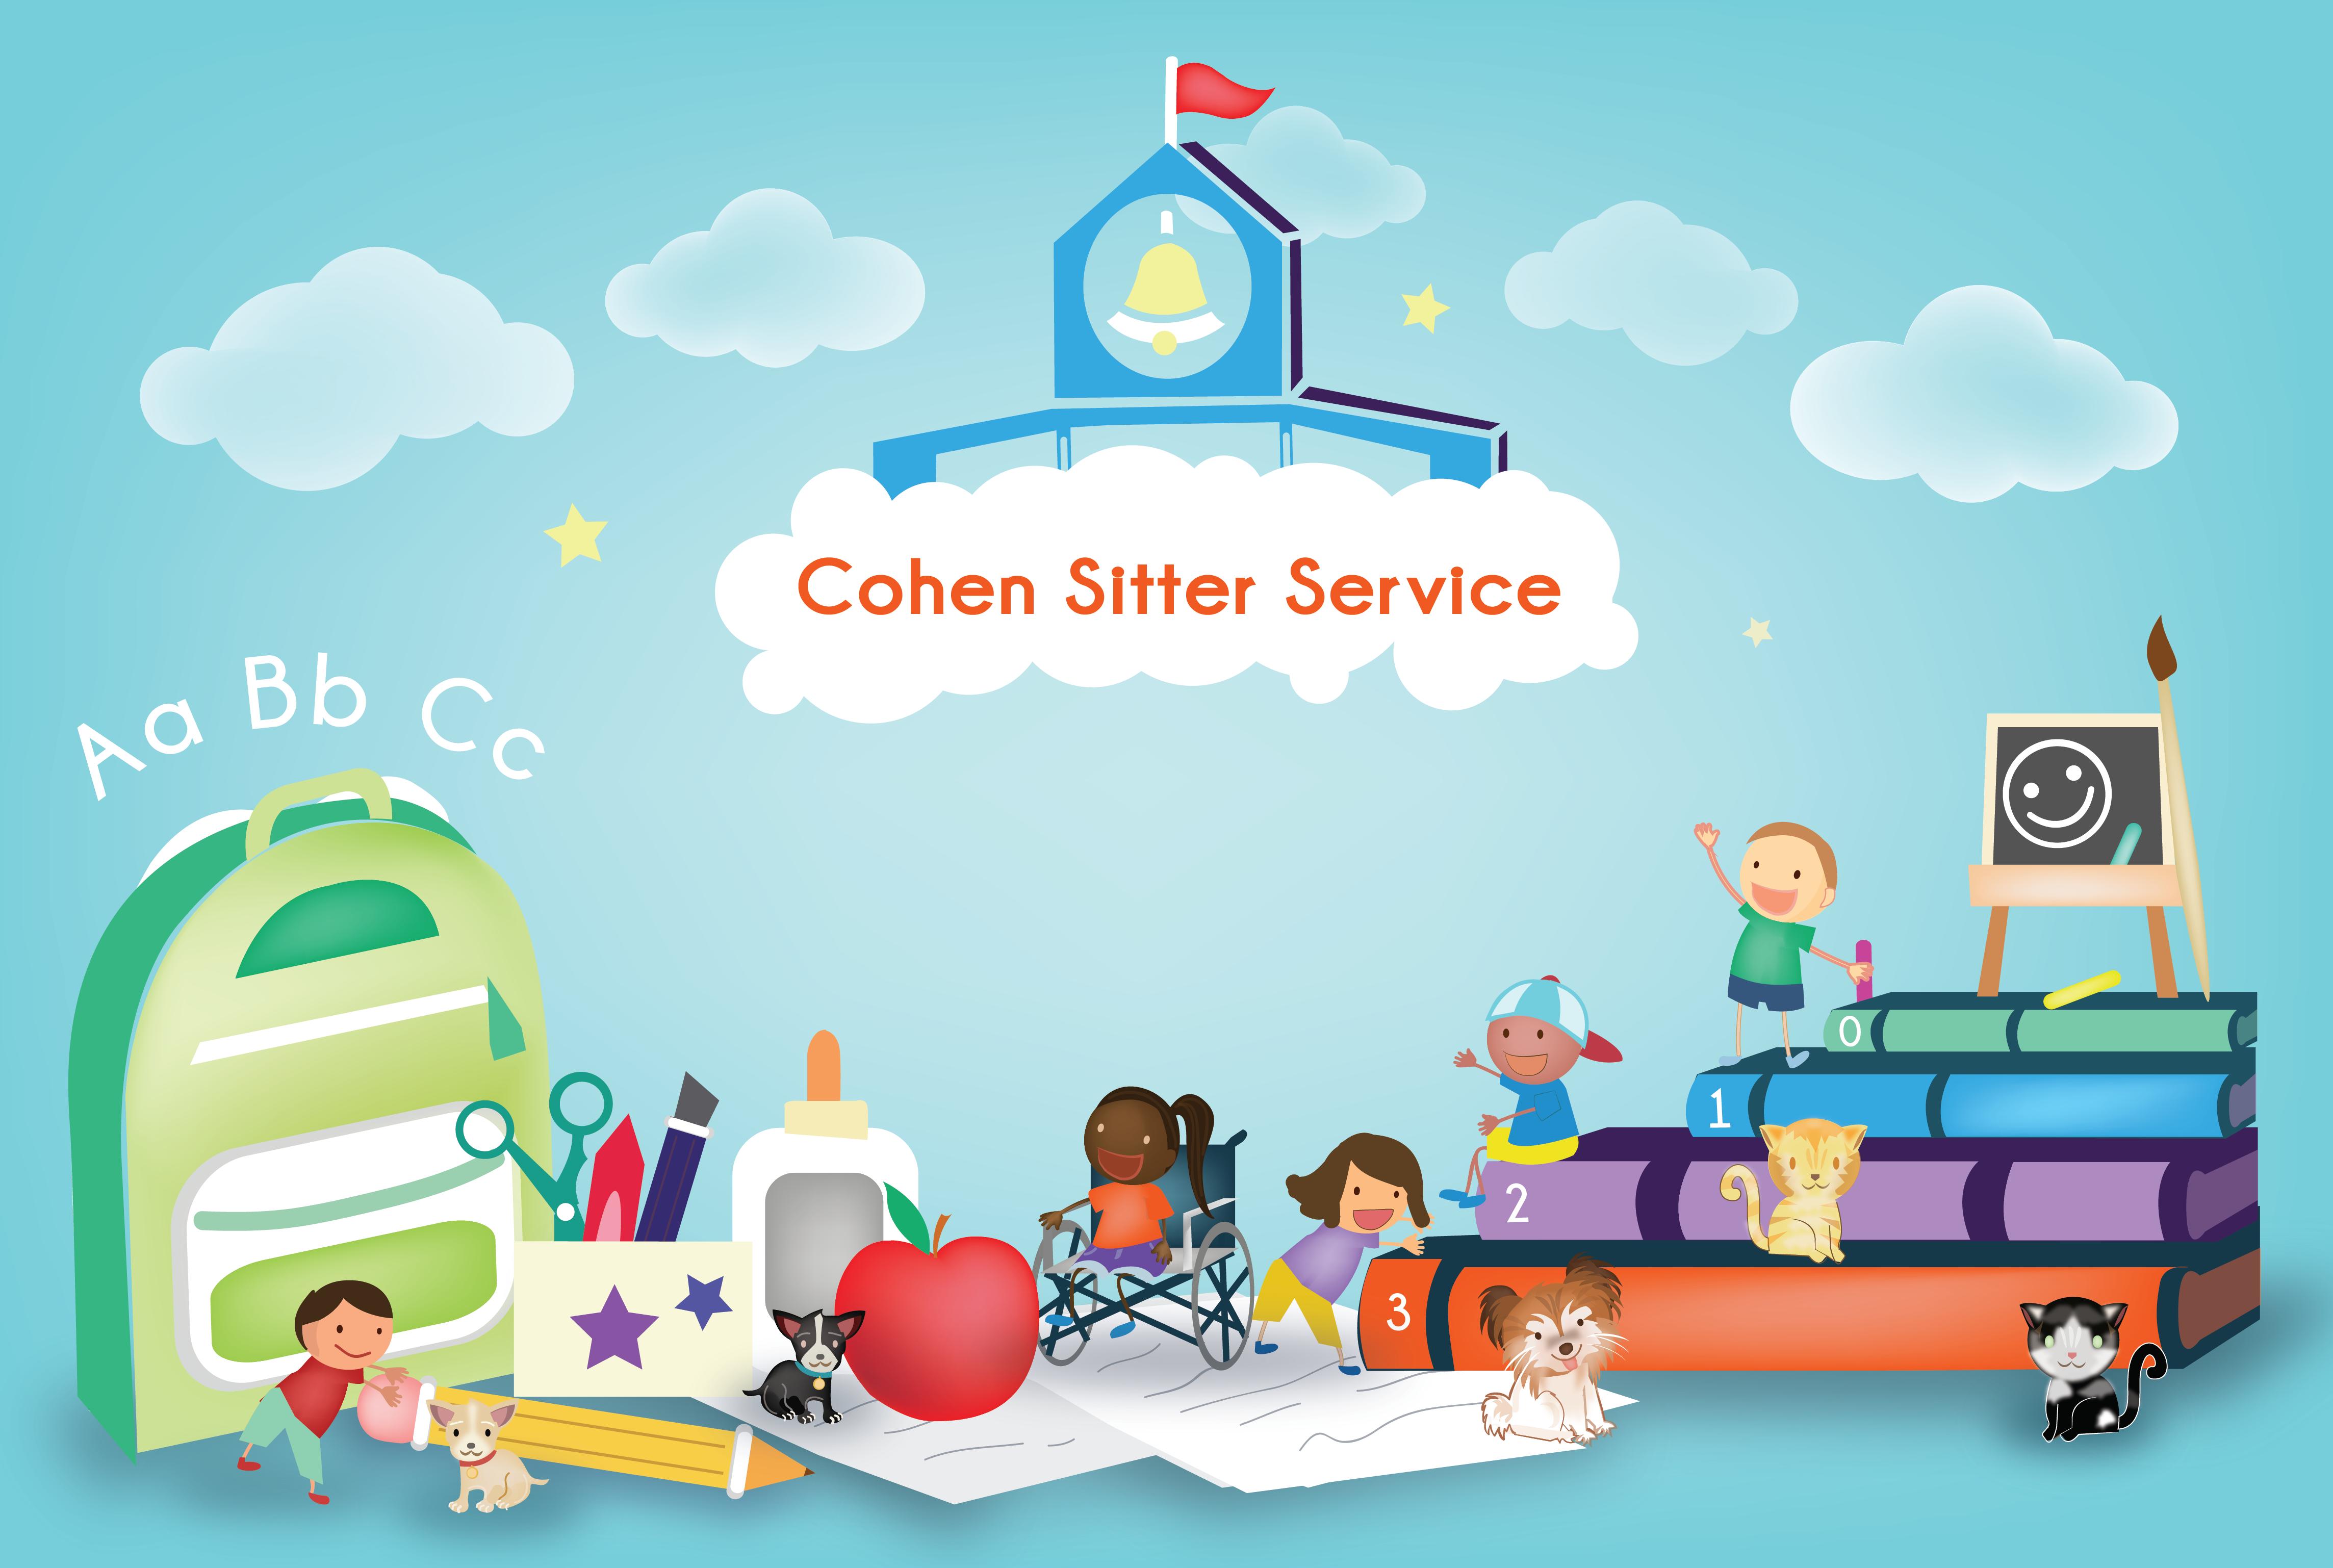 Cohen Sitter Service, LLC